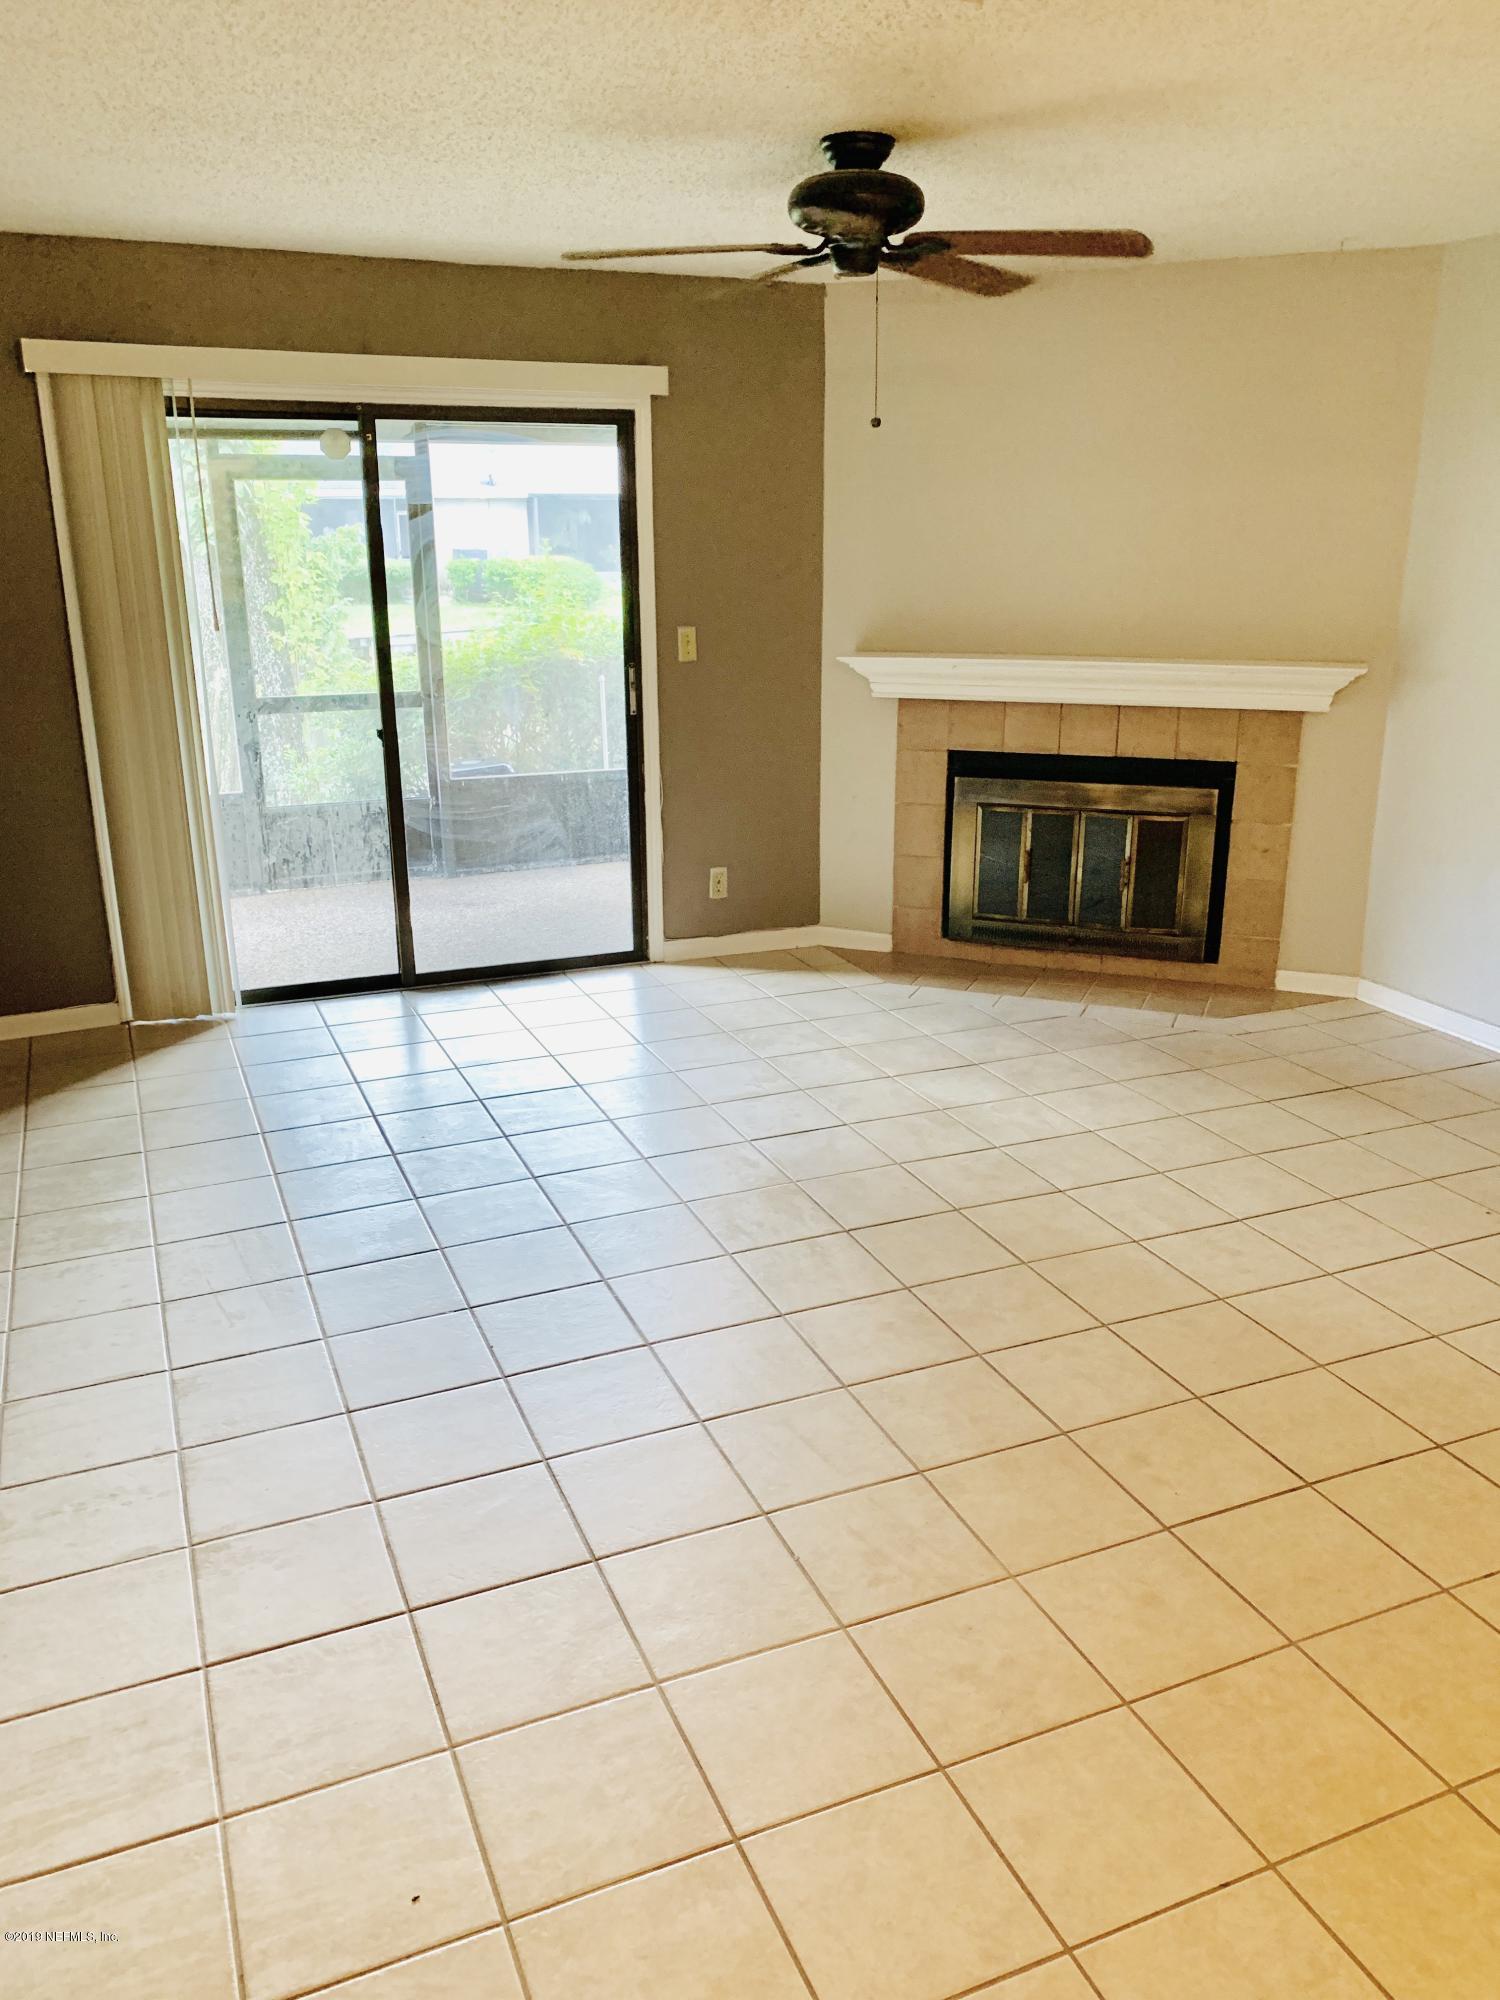 7701 BAYMEADOWS, JACKSONVILLE, FLORIDA 32256, 2 Bedrooms Bedrooms, ,2 BathroomsBathrooms,Condo,For sale,BAYMEADOWS,1009139